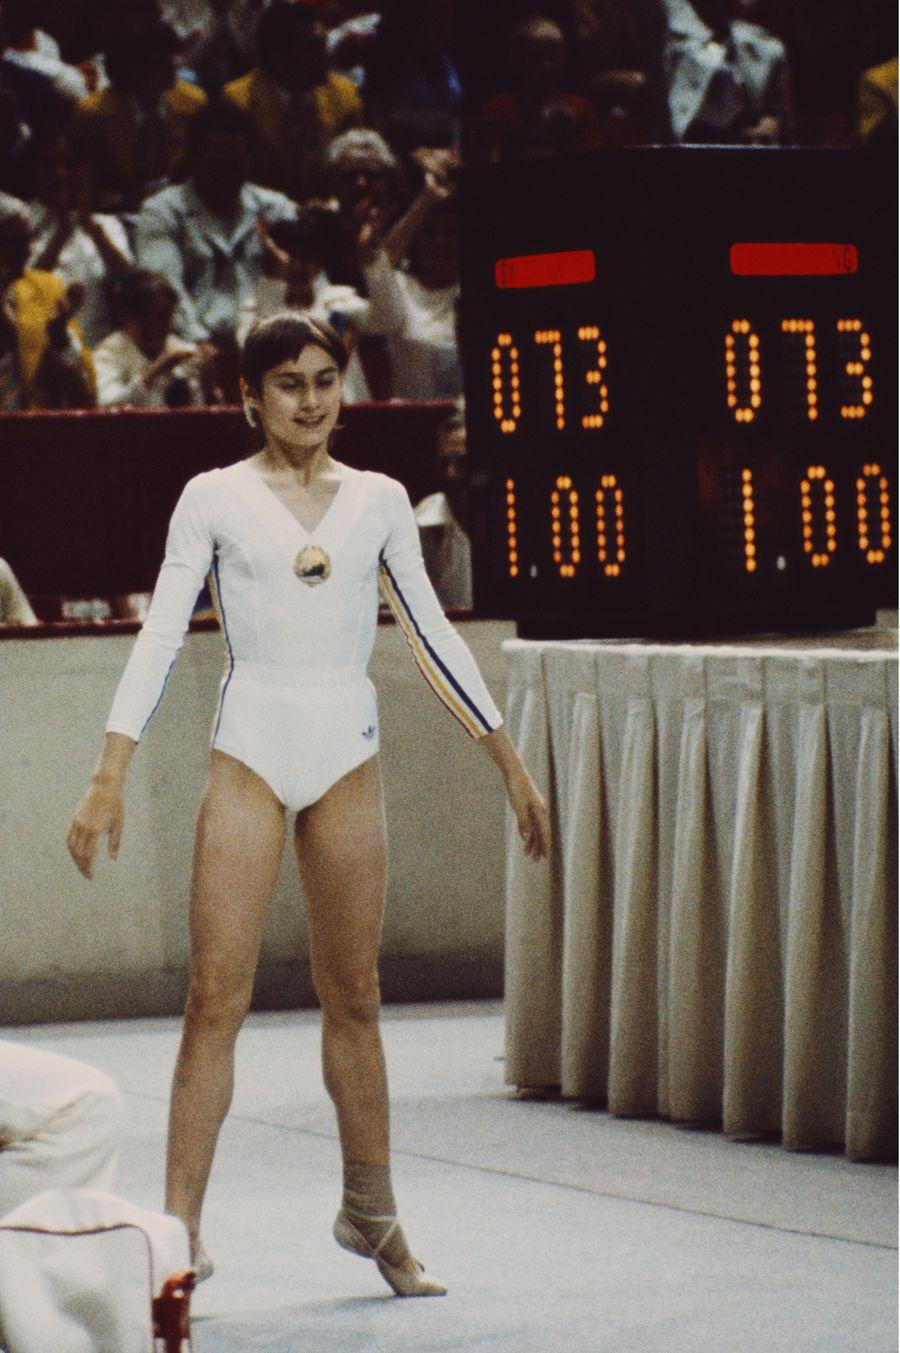 Nadia Comăneci și nota de 1.00 în 1976 la Montreal FOTO Guliver/GettyImages